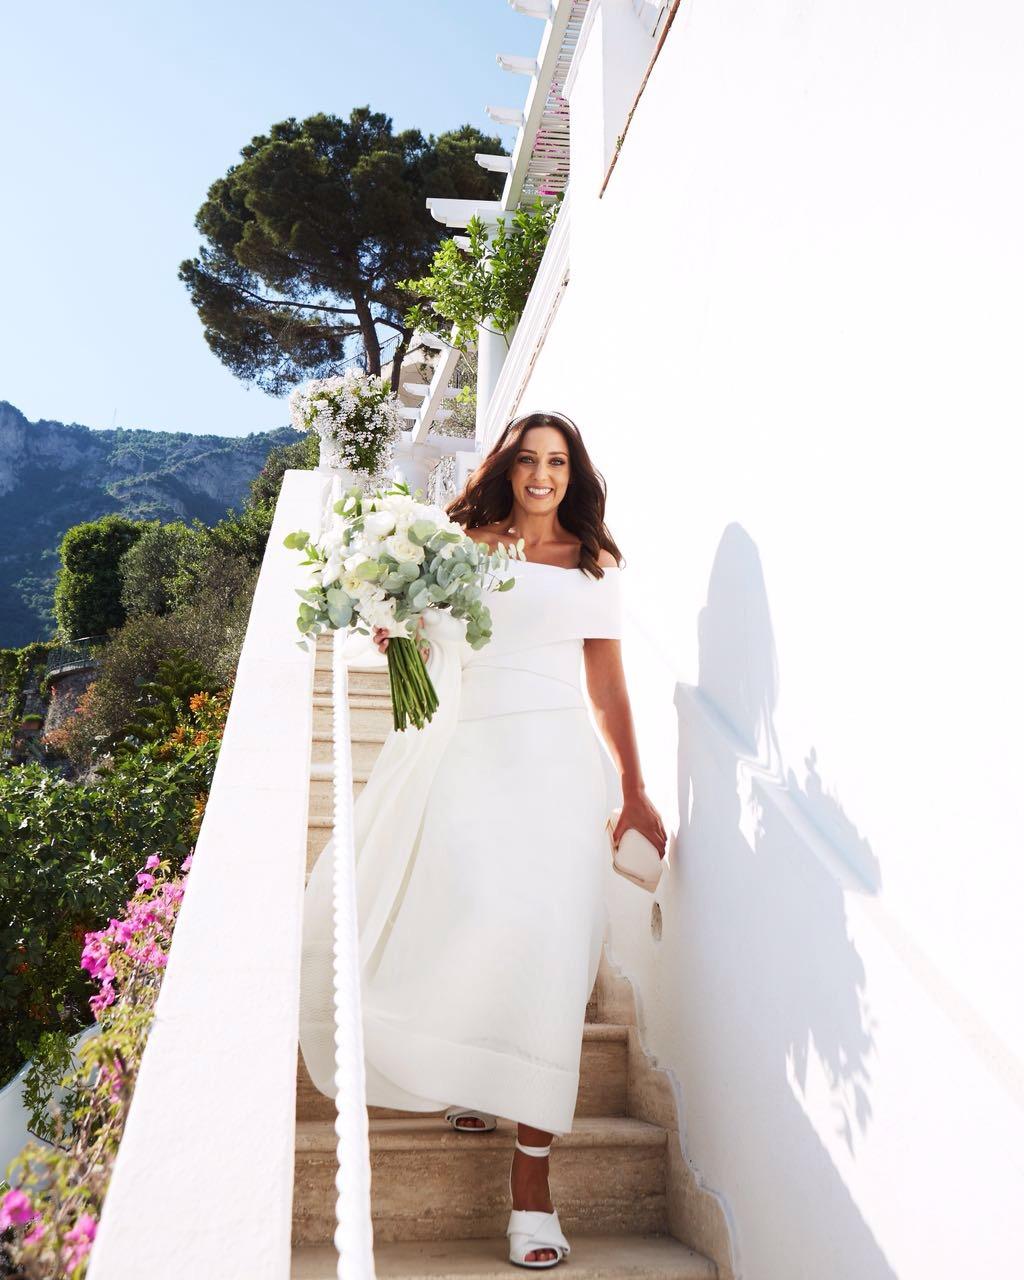 https://www.weddingamalfi.com/wp-content/uploads/Laura-and-Jarrod-here-comes-the-bride.jpg